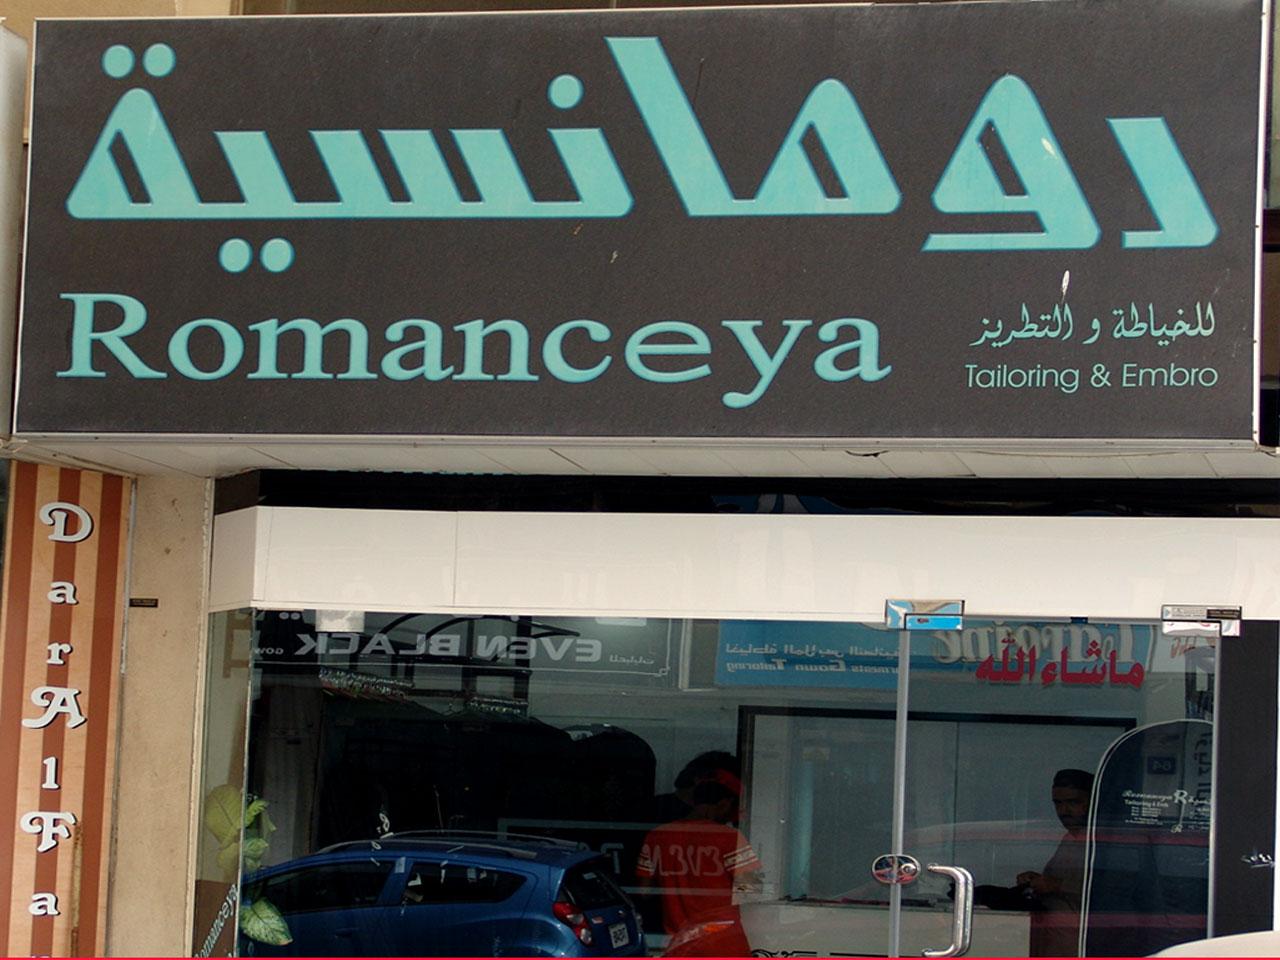 Romanceya Tailoring & Embro - DSC01742.jpg